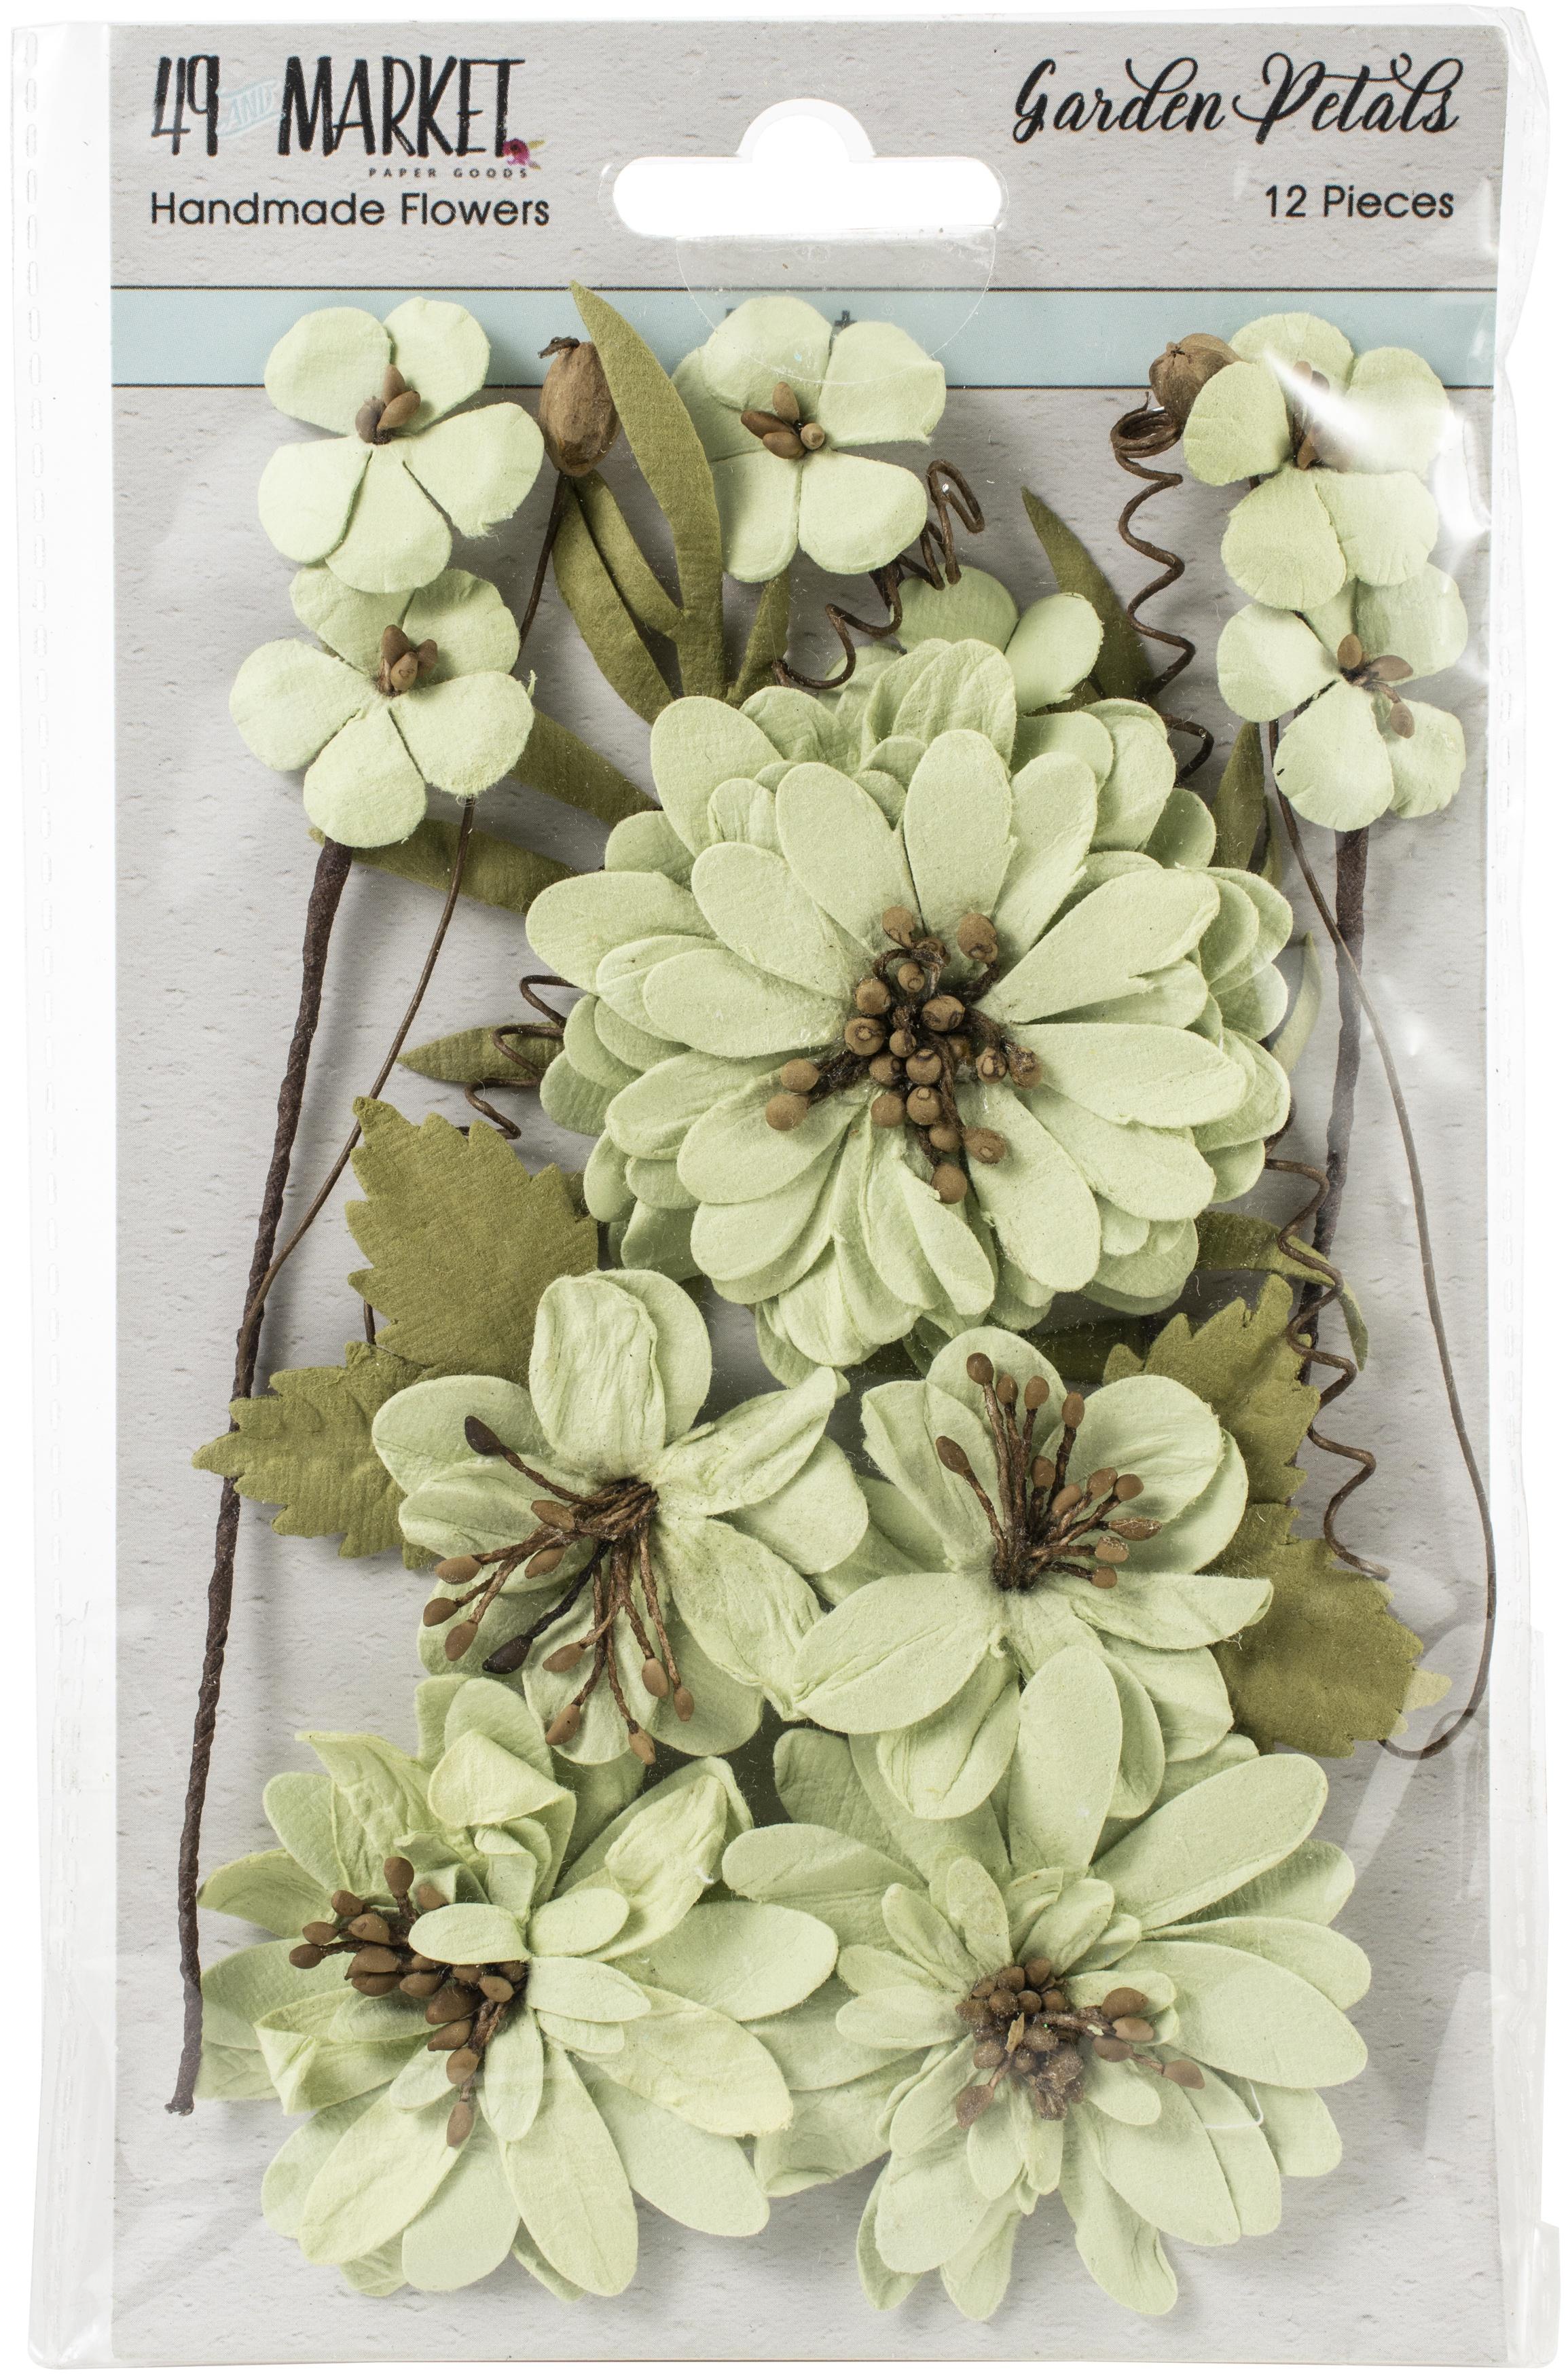 49 and Market Garden Petals Mint